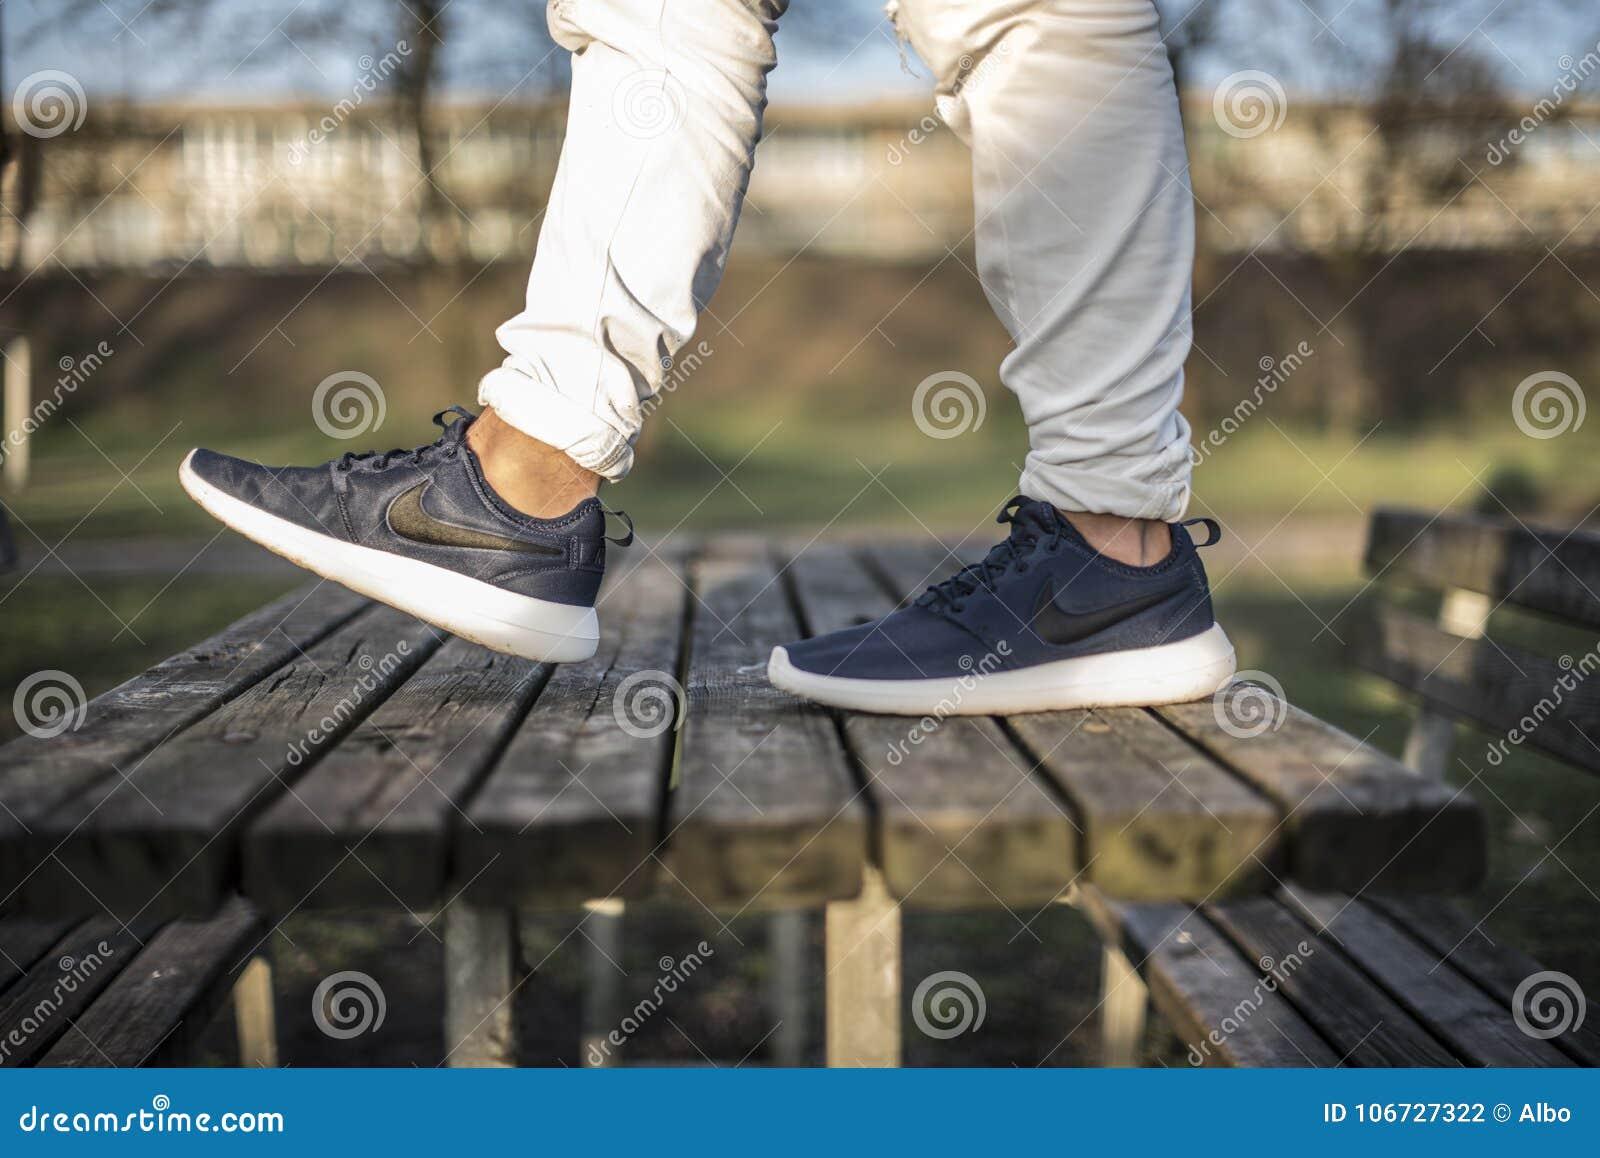 Nike Schuhe Redaktionelles In Run Roche 2 Der Straße KulFJc315T